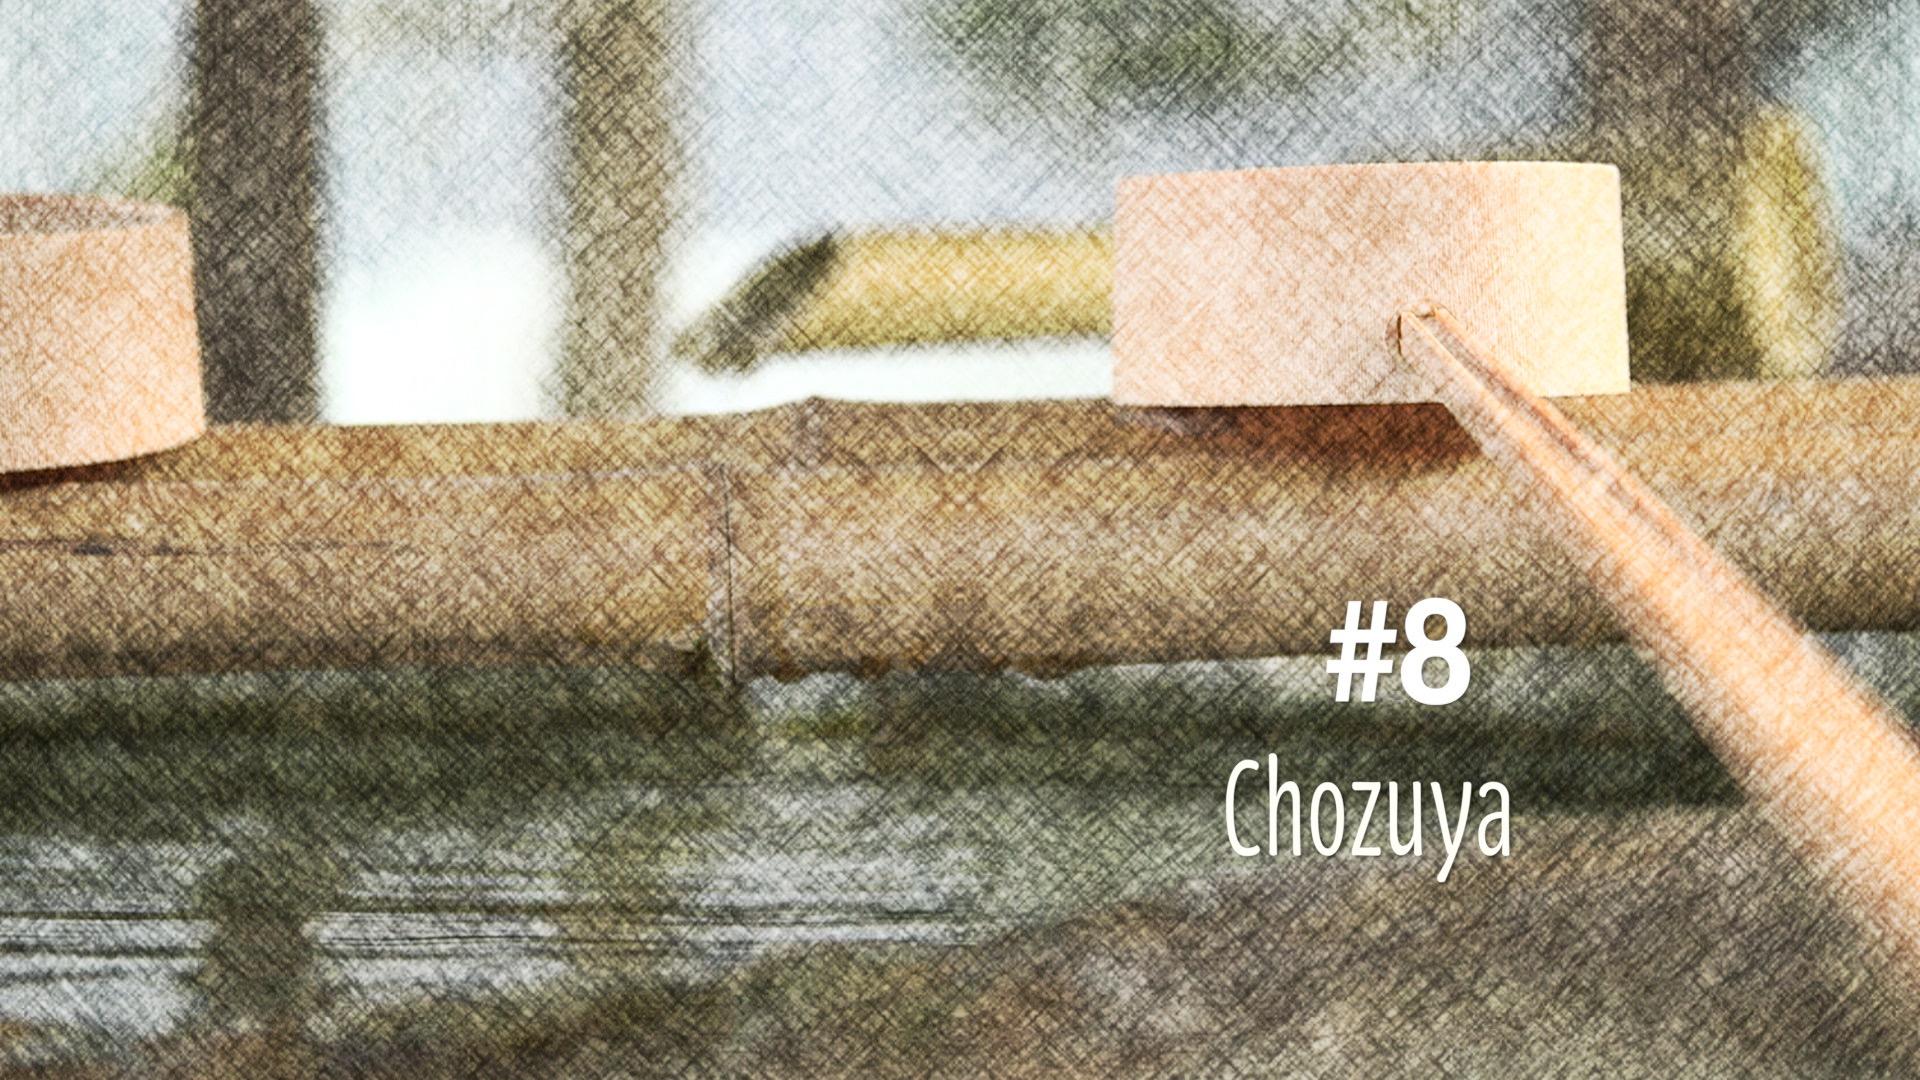 Le Chozuya (#8)